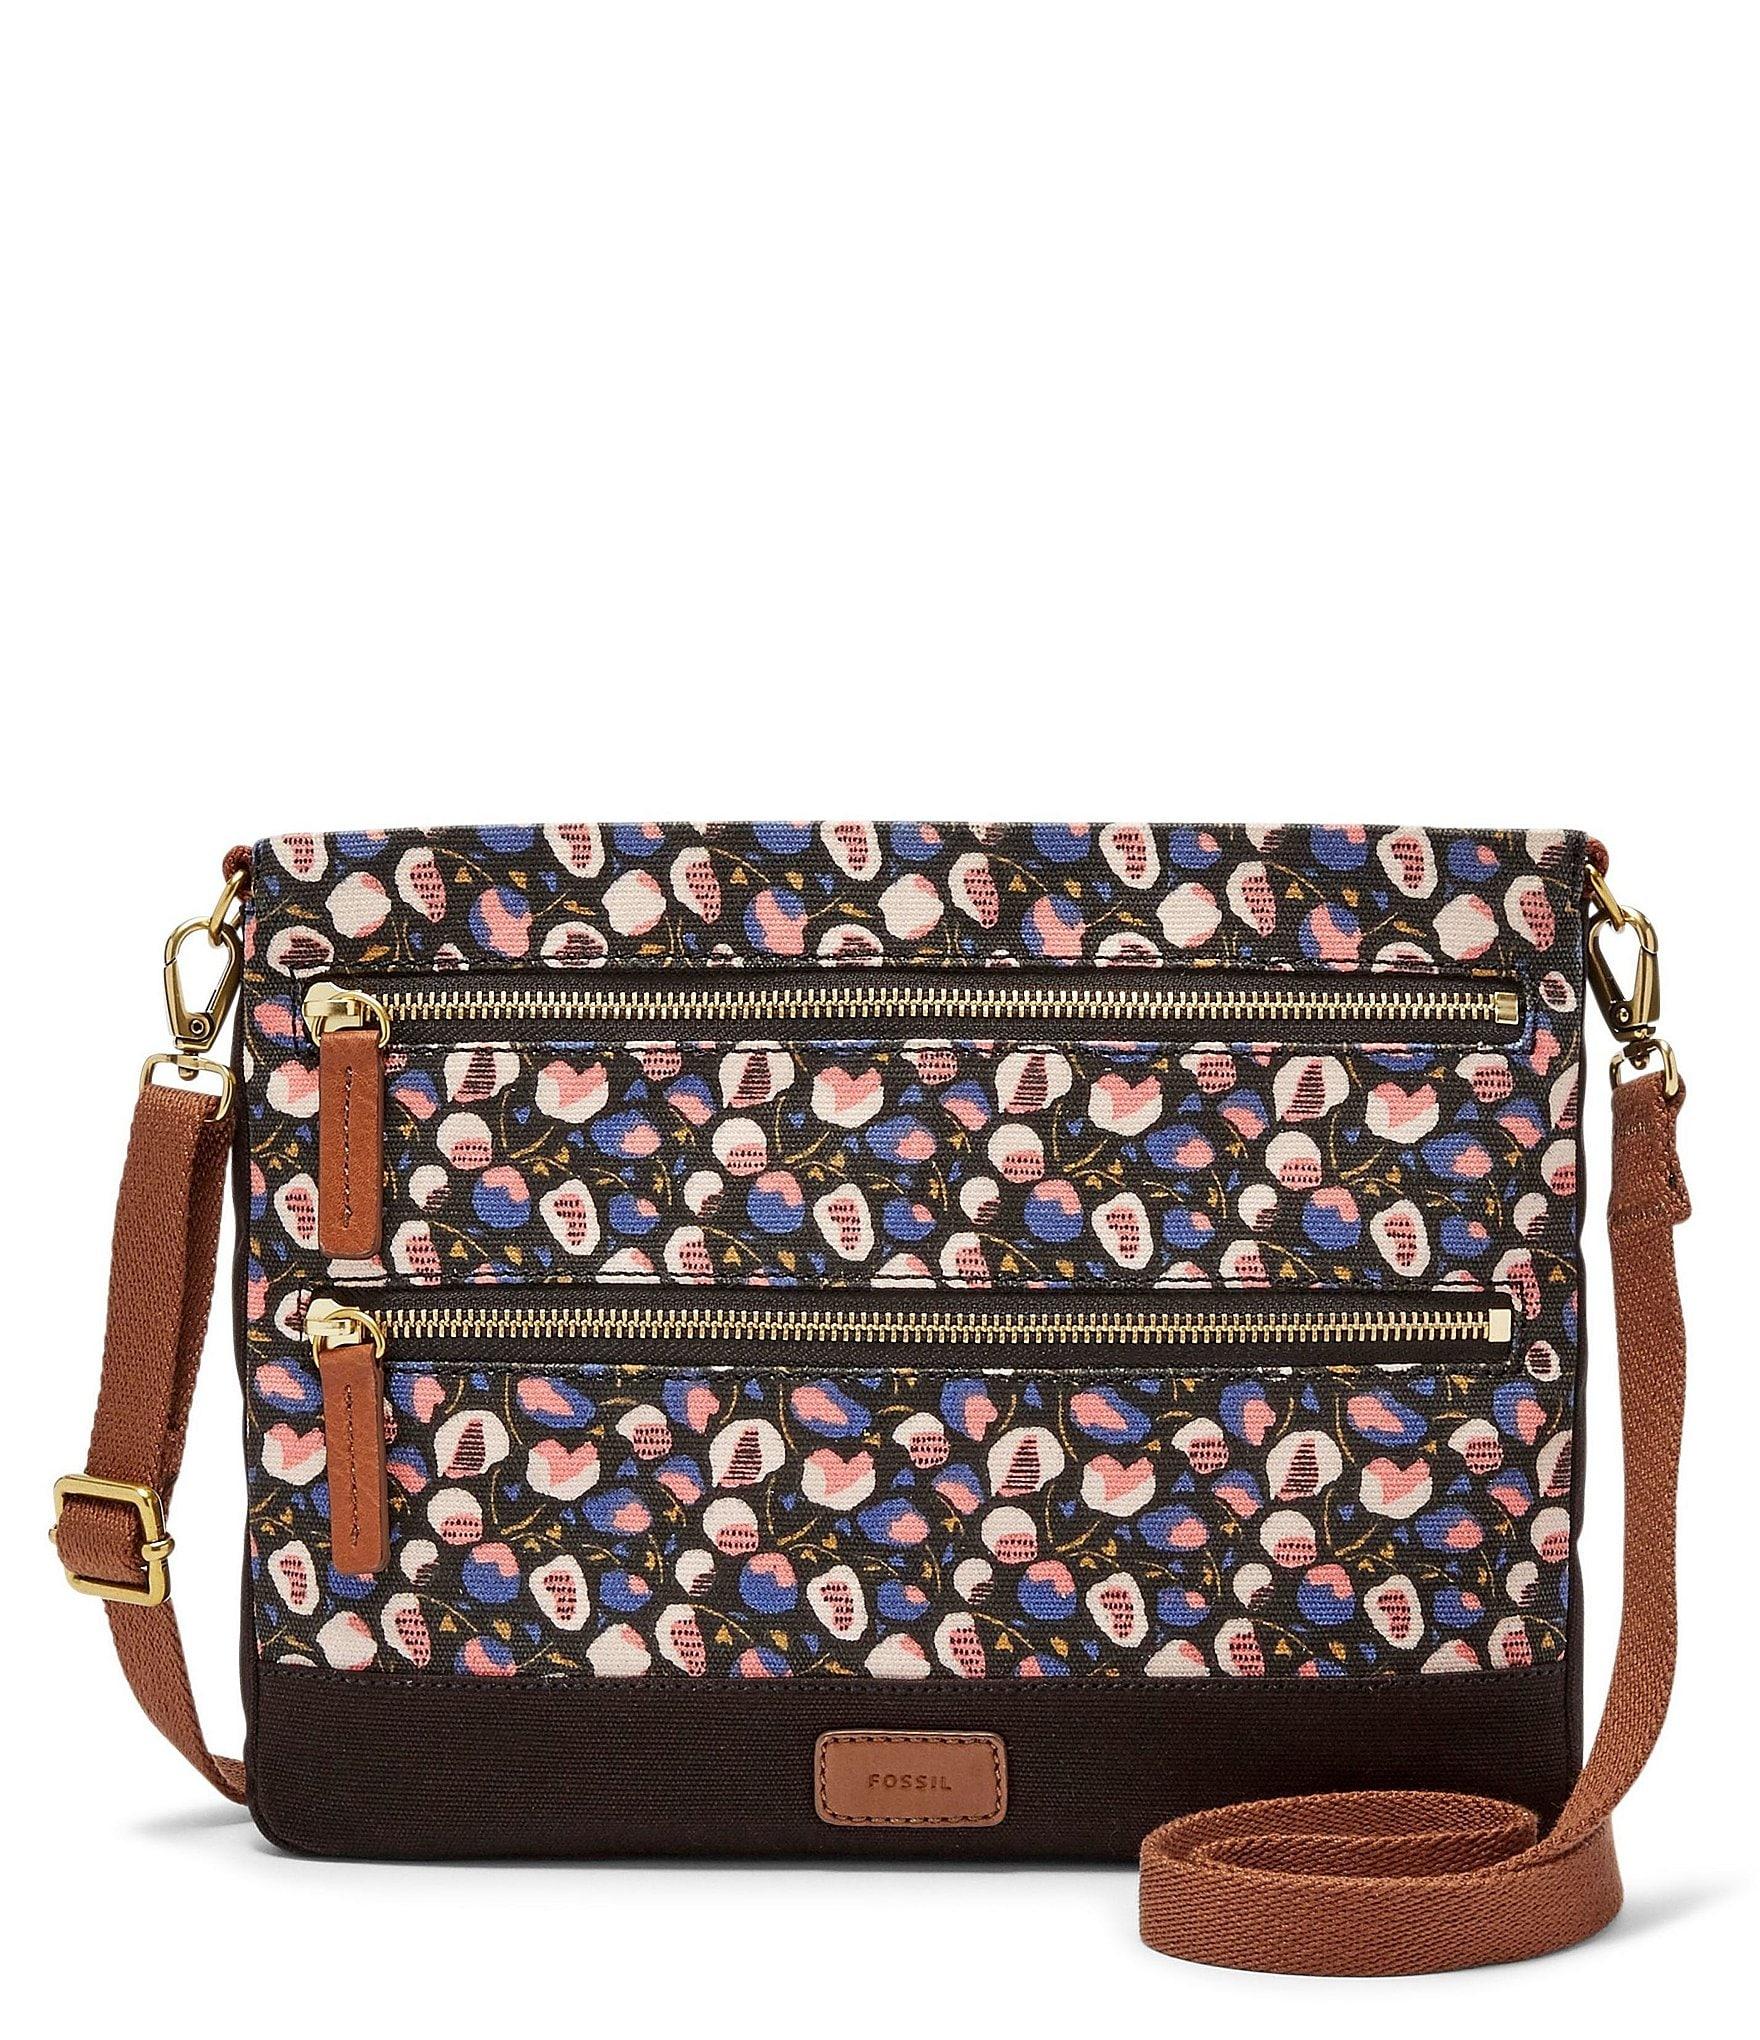 Fossil Passport Floral Cross-Body Bag | Dillards